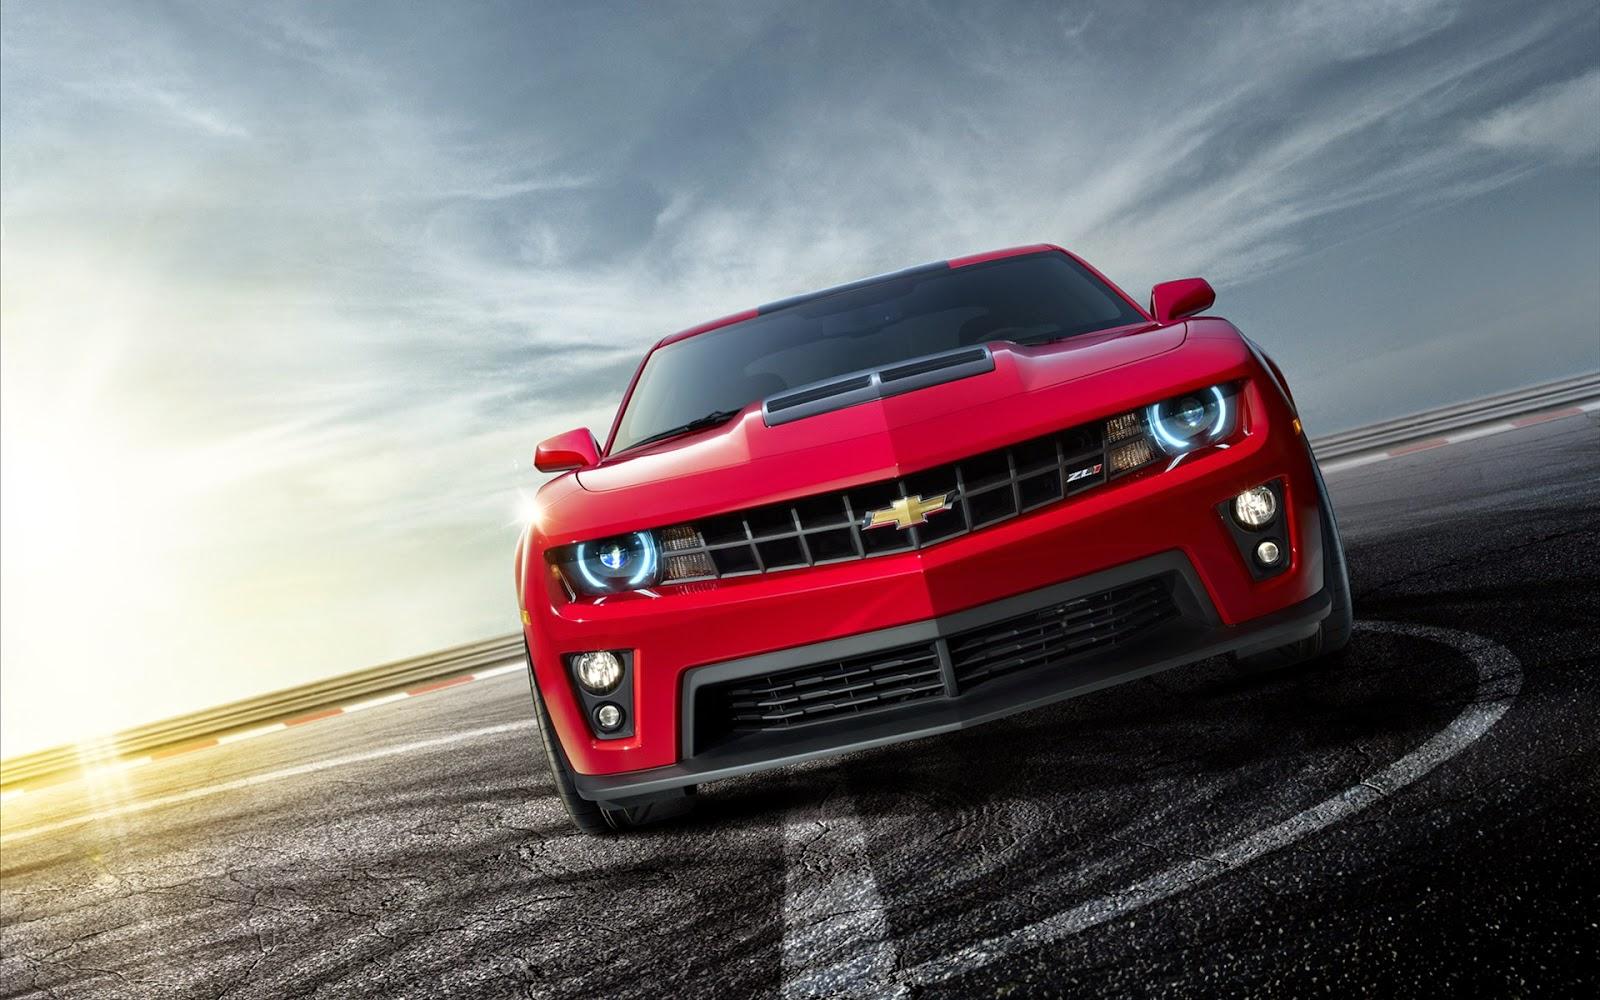 http://www.autocarsinfo.com/2014/10/chevrolet-camaro-zl1-2012-best-wallpaper.html